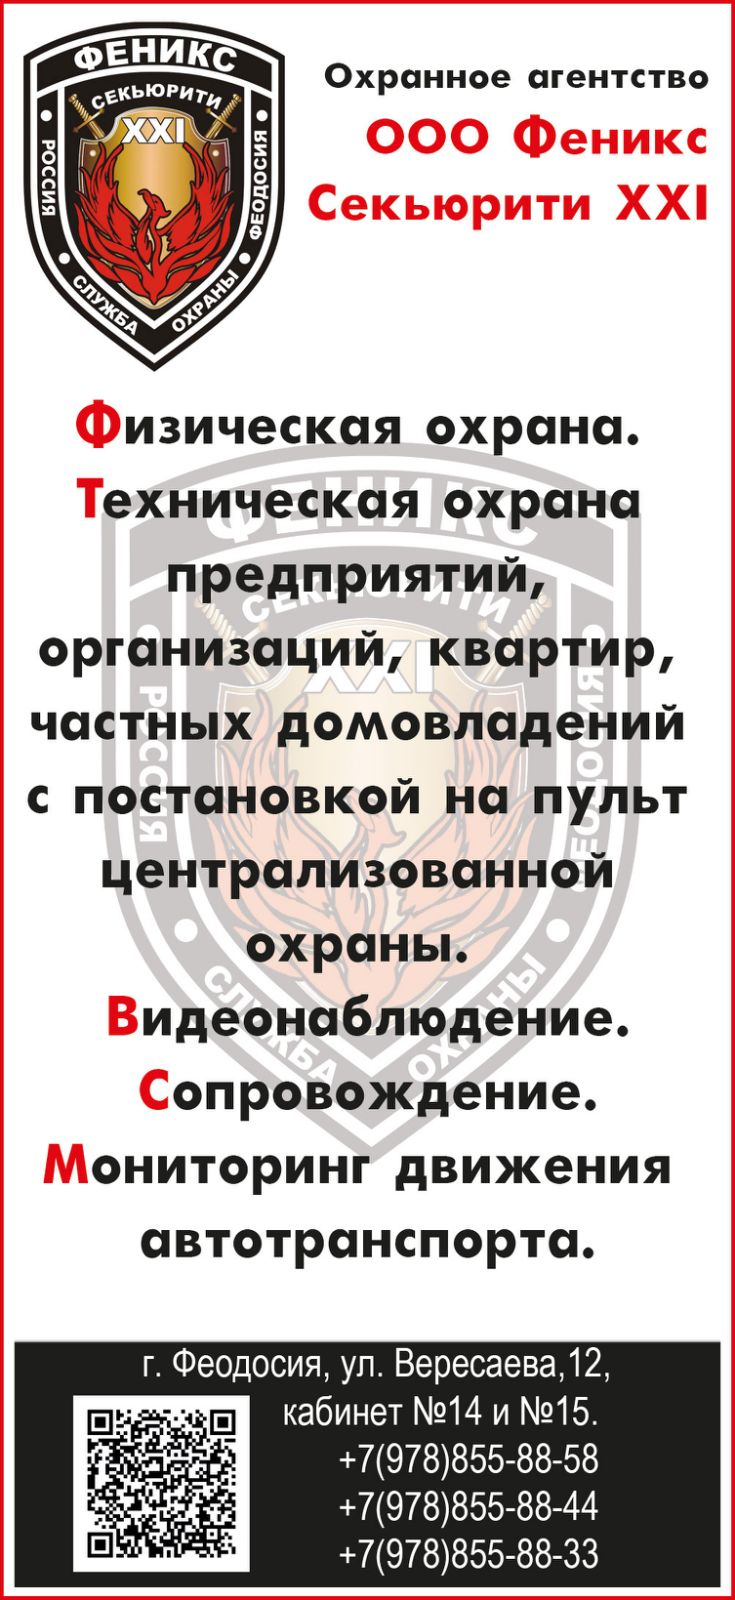 http://fenix-feo.ru/